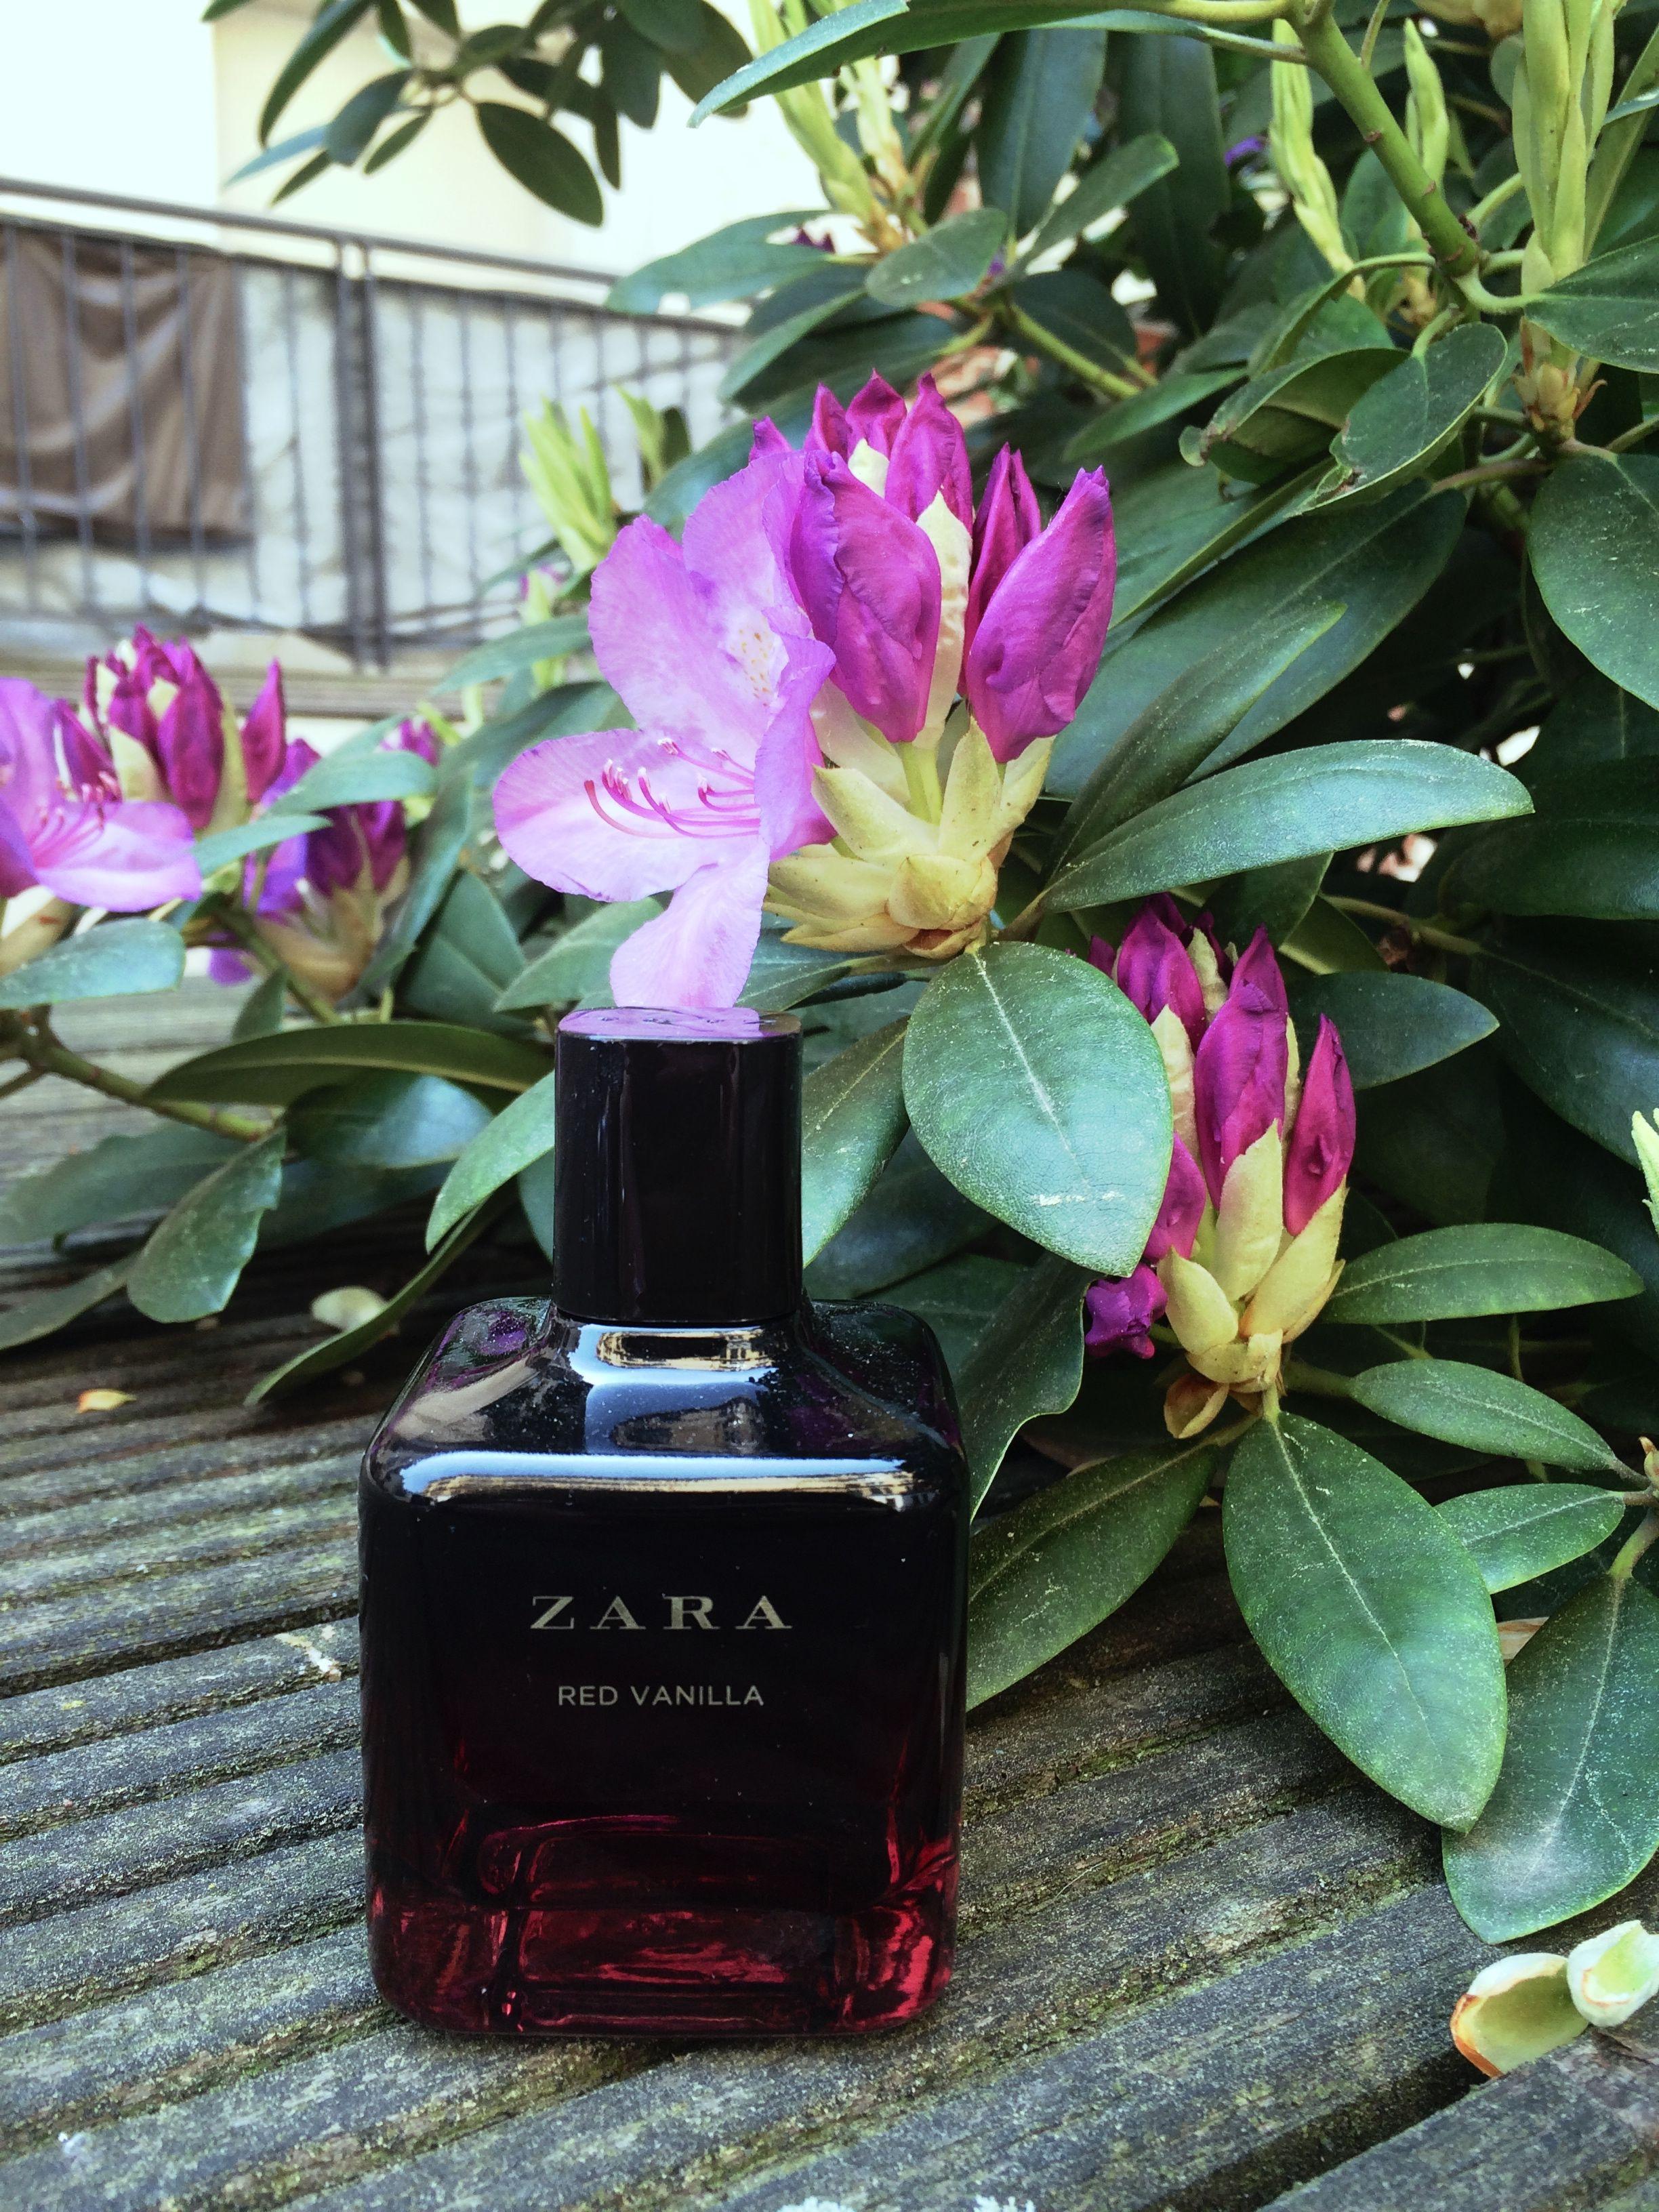 Zara Perfume Red Vanilla Cheap But Beautiful Oriental Perfume